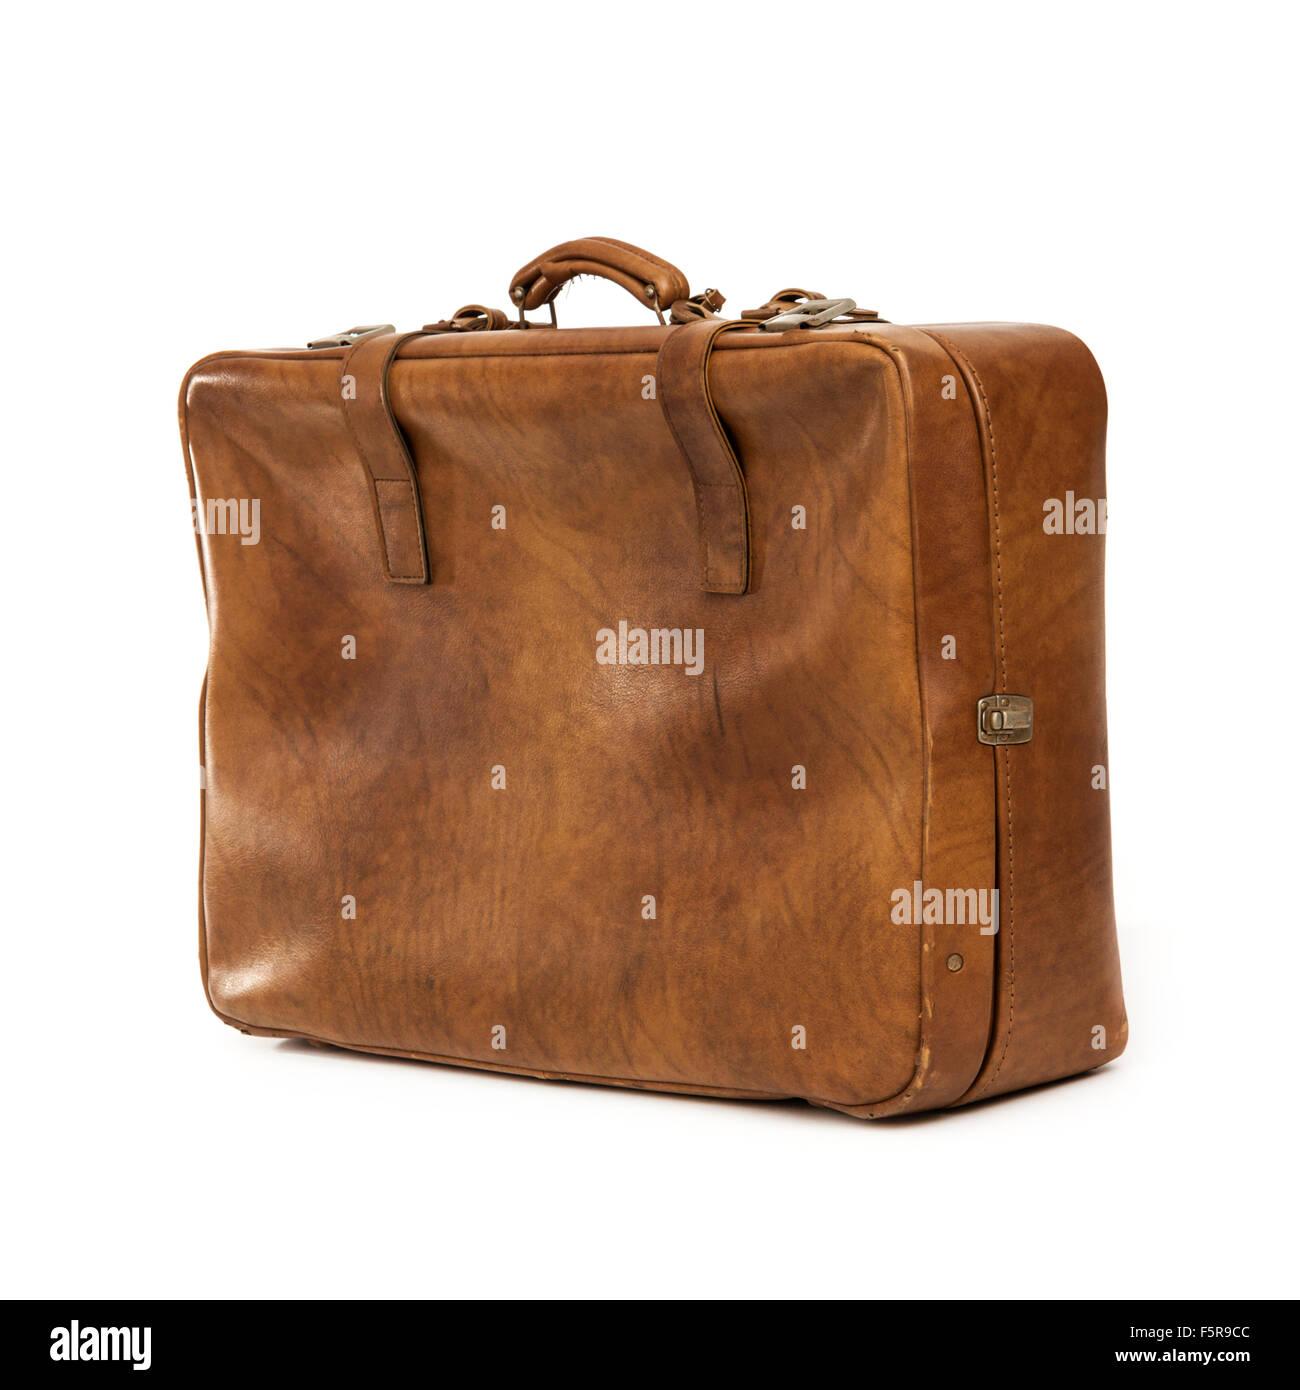 Vintage 'Vulco' suitcase made by Näsijärven Pahvitehdas Oy of Finland (Näsijärvi Cardboard - Stock Image